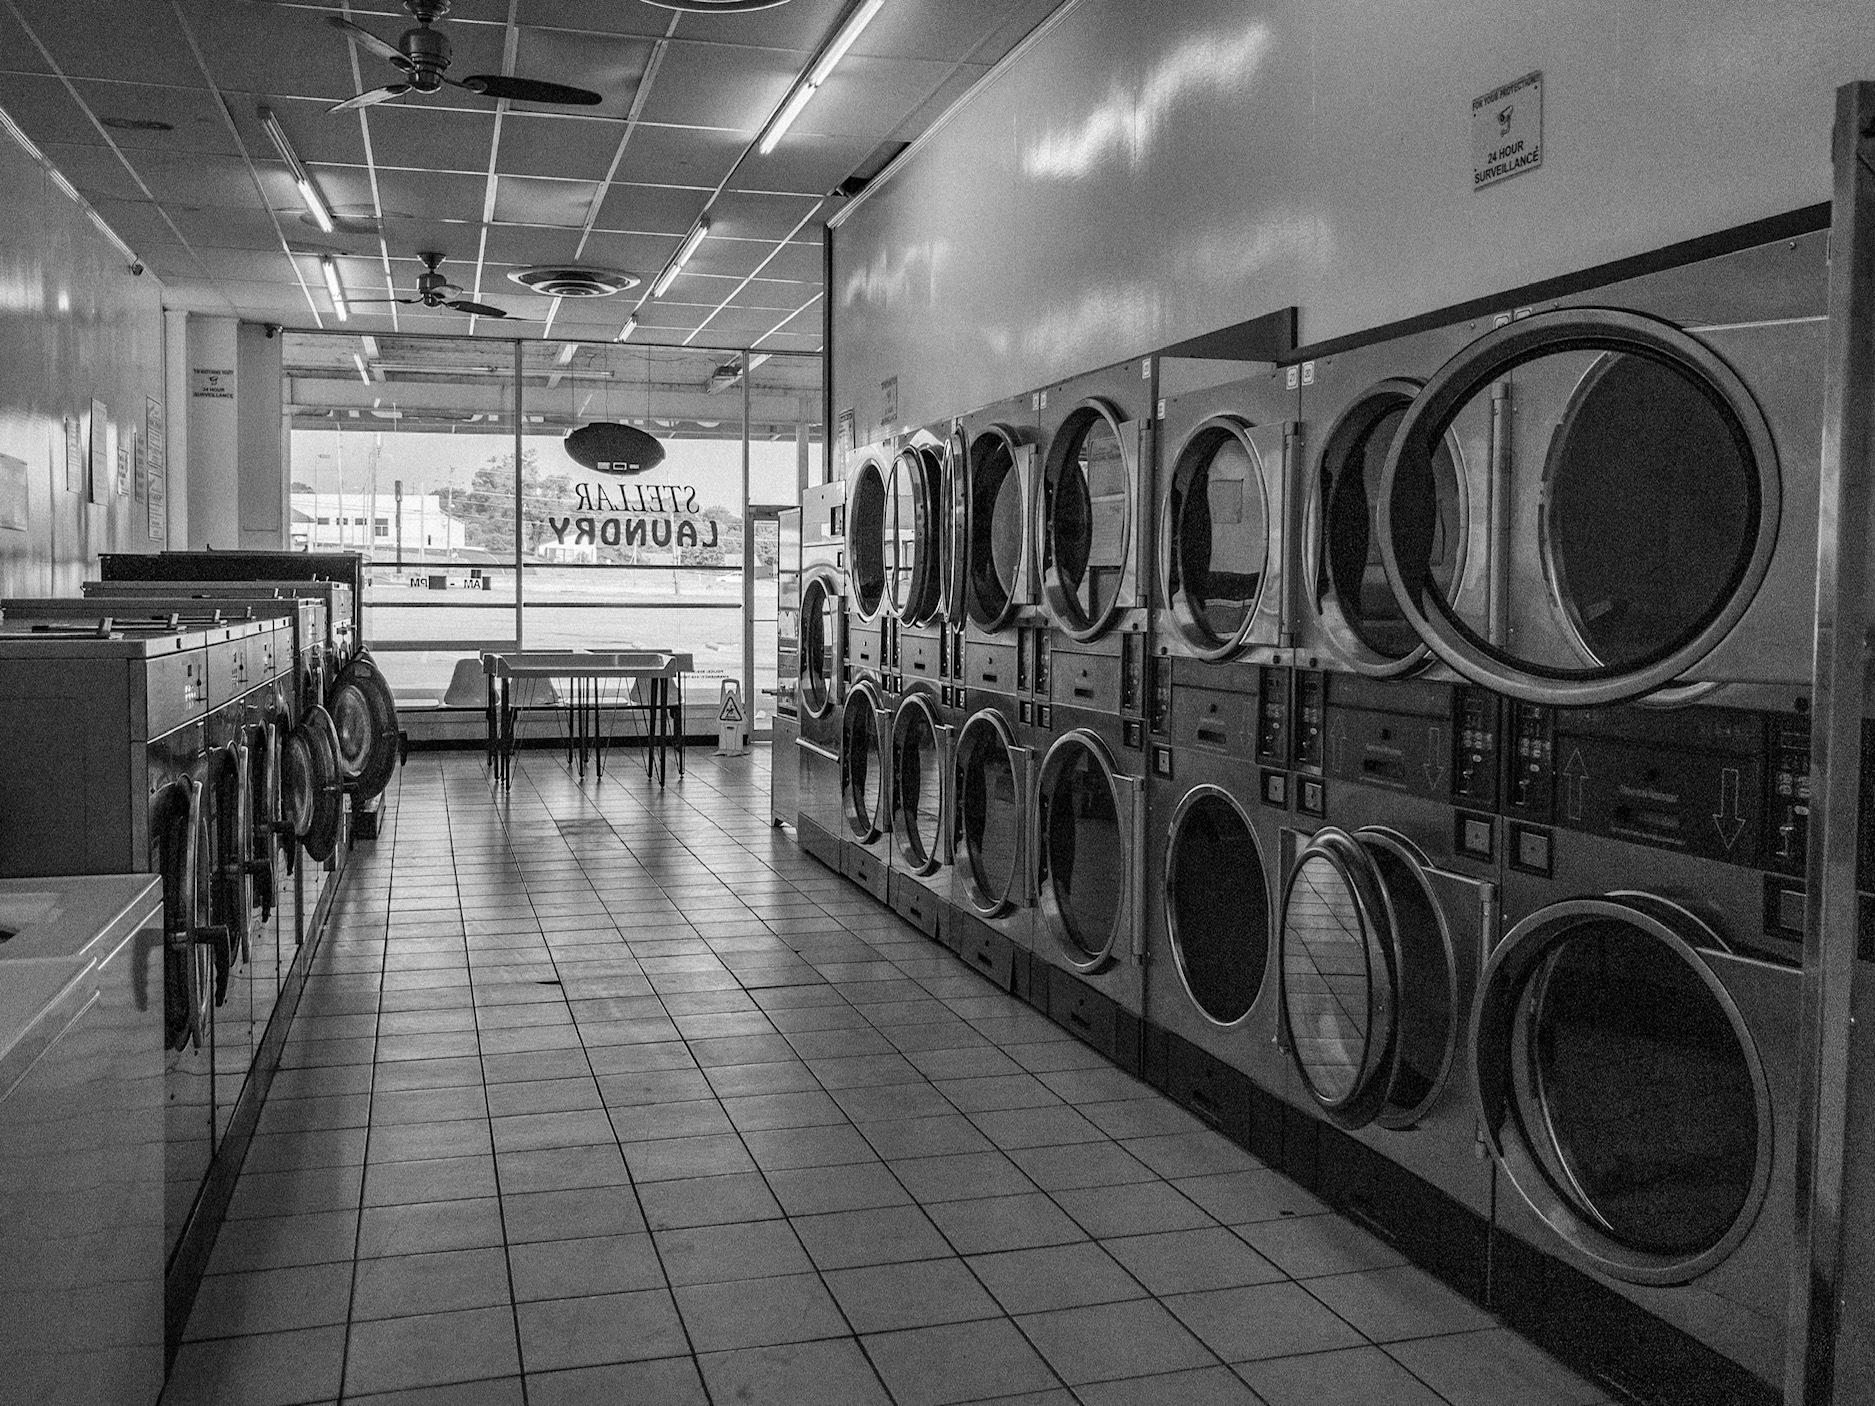 Laundromat bw apc 0350